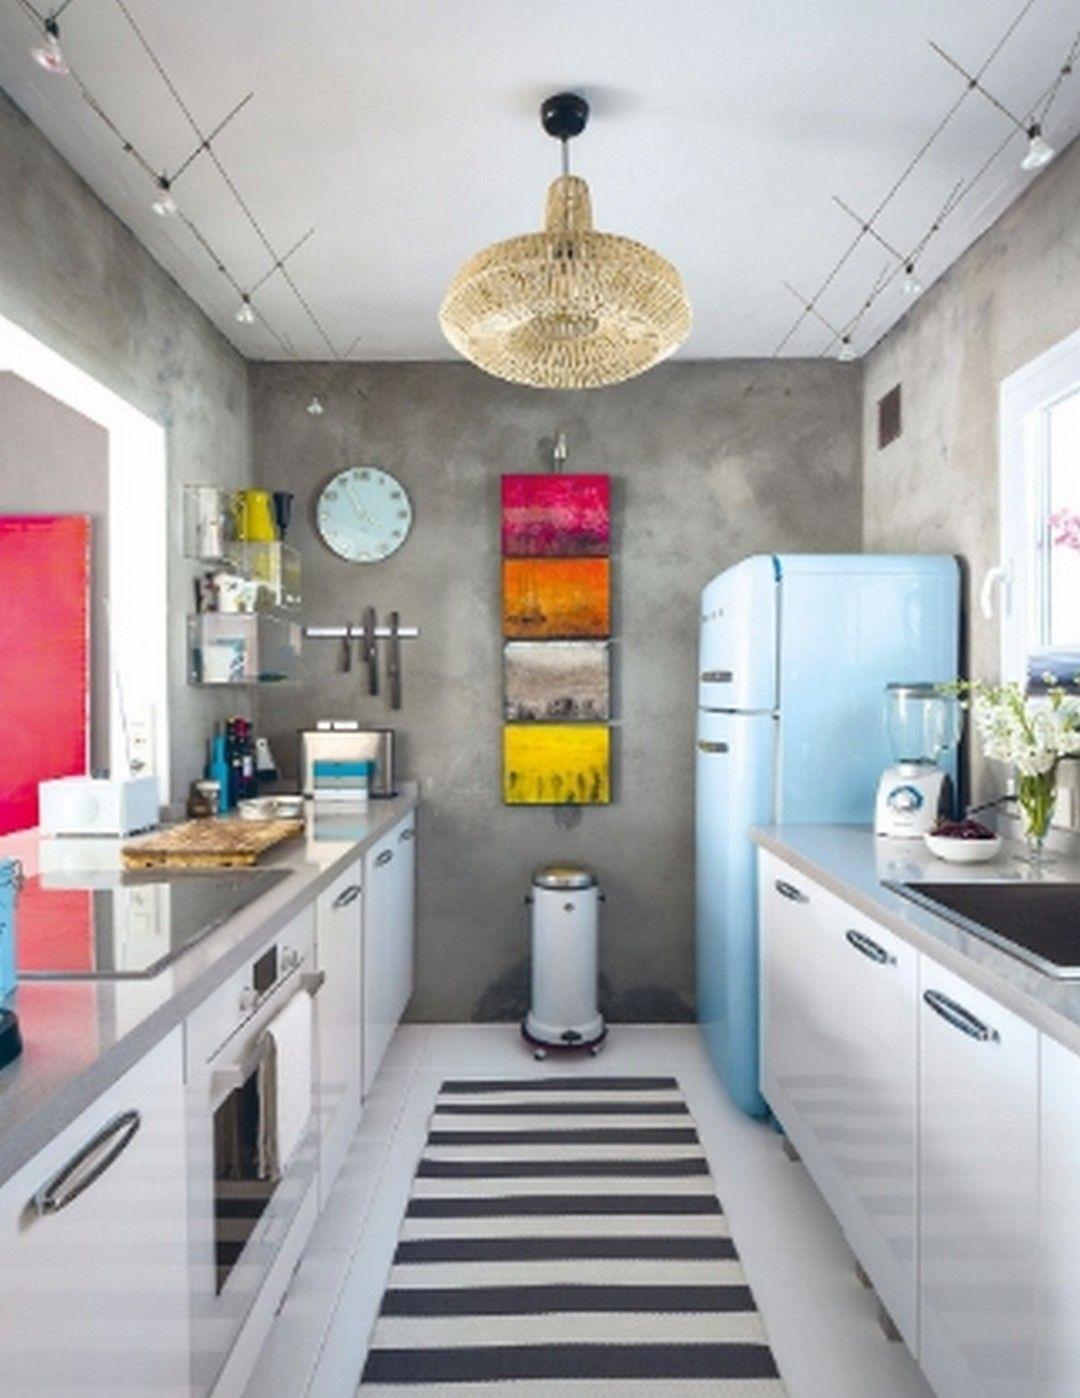 7 Outstanding Galley Kitchen Design Ideas in 2020 | Small galley kitchens, Galley kitchens ...